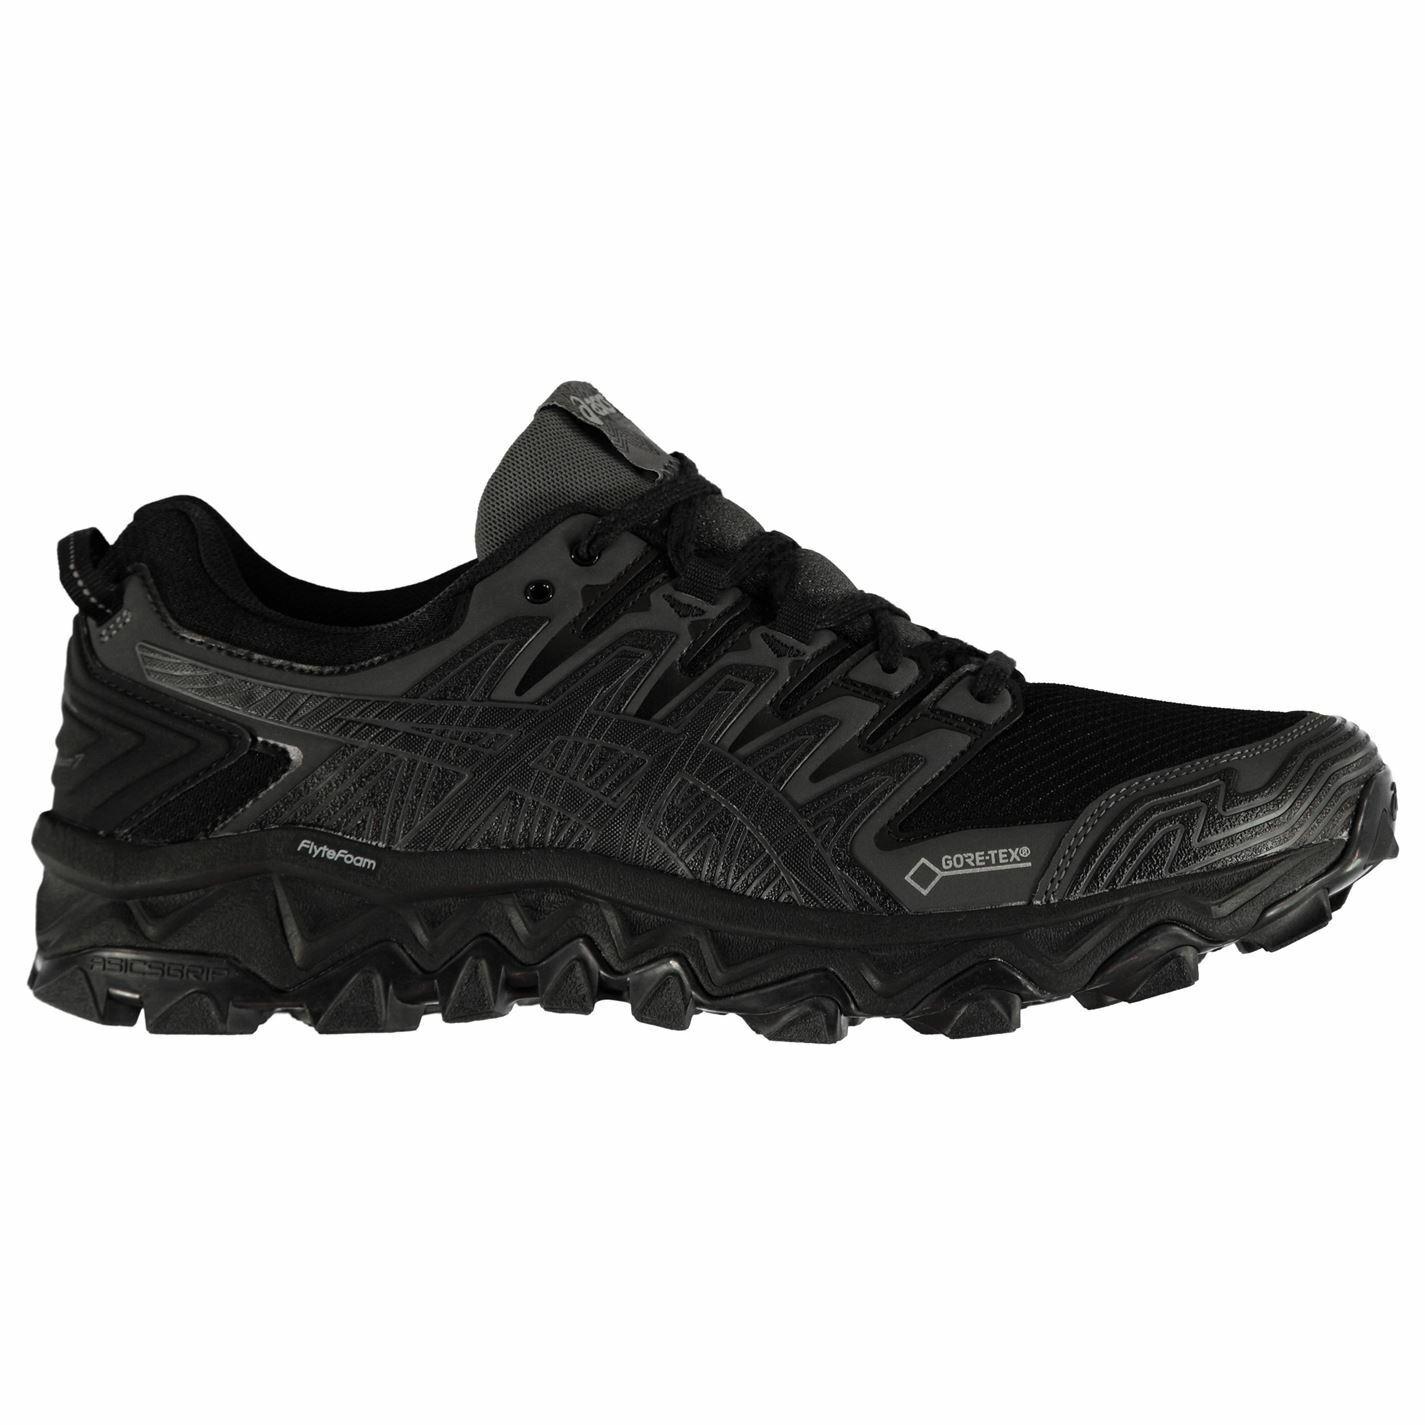 Asics Mens GEL FujiTrabuco 7 GTX Running shoes Trail Waterproof Outdoor